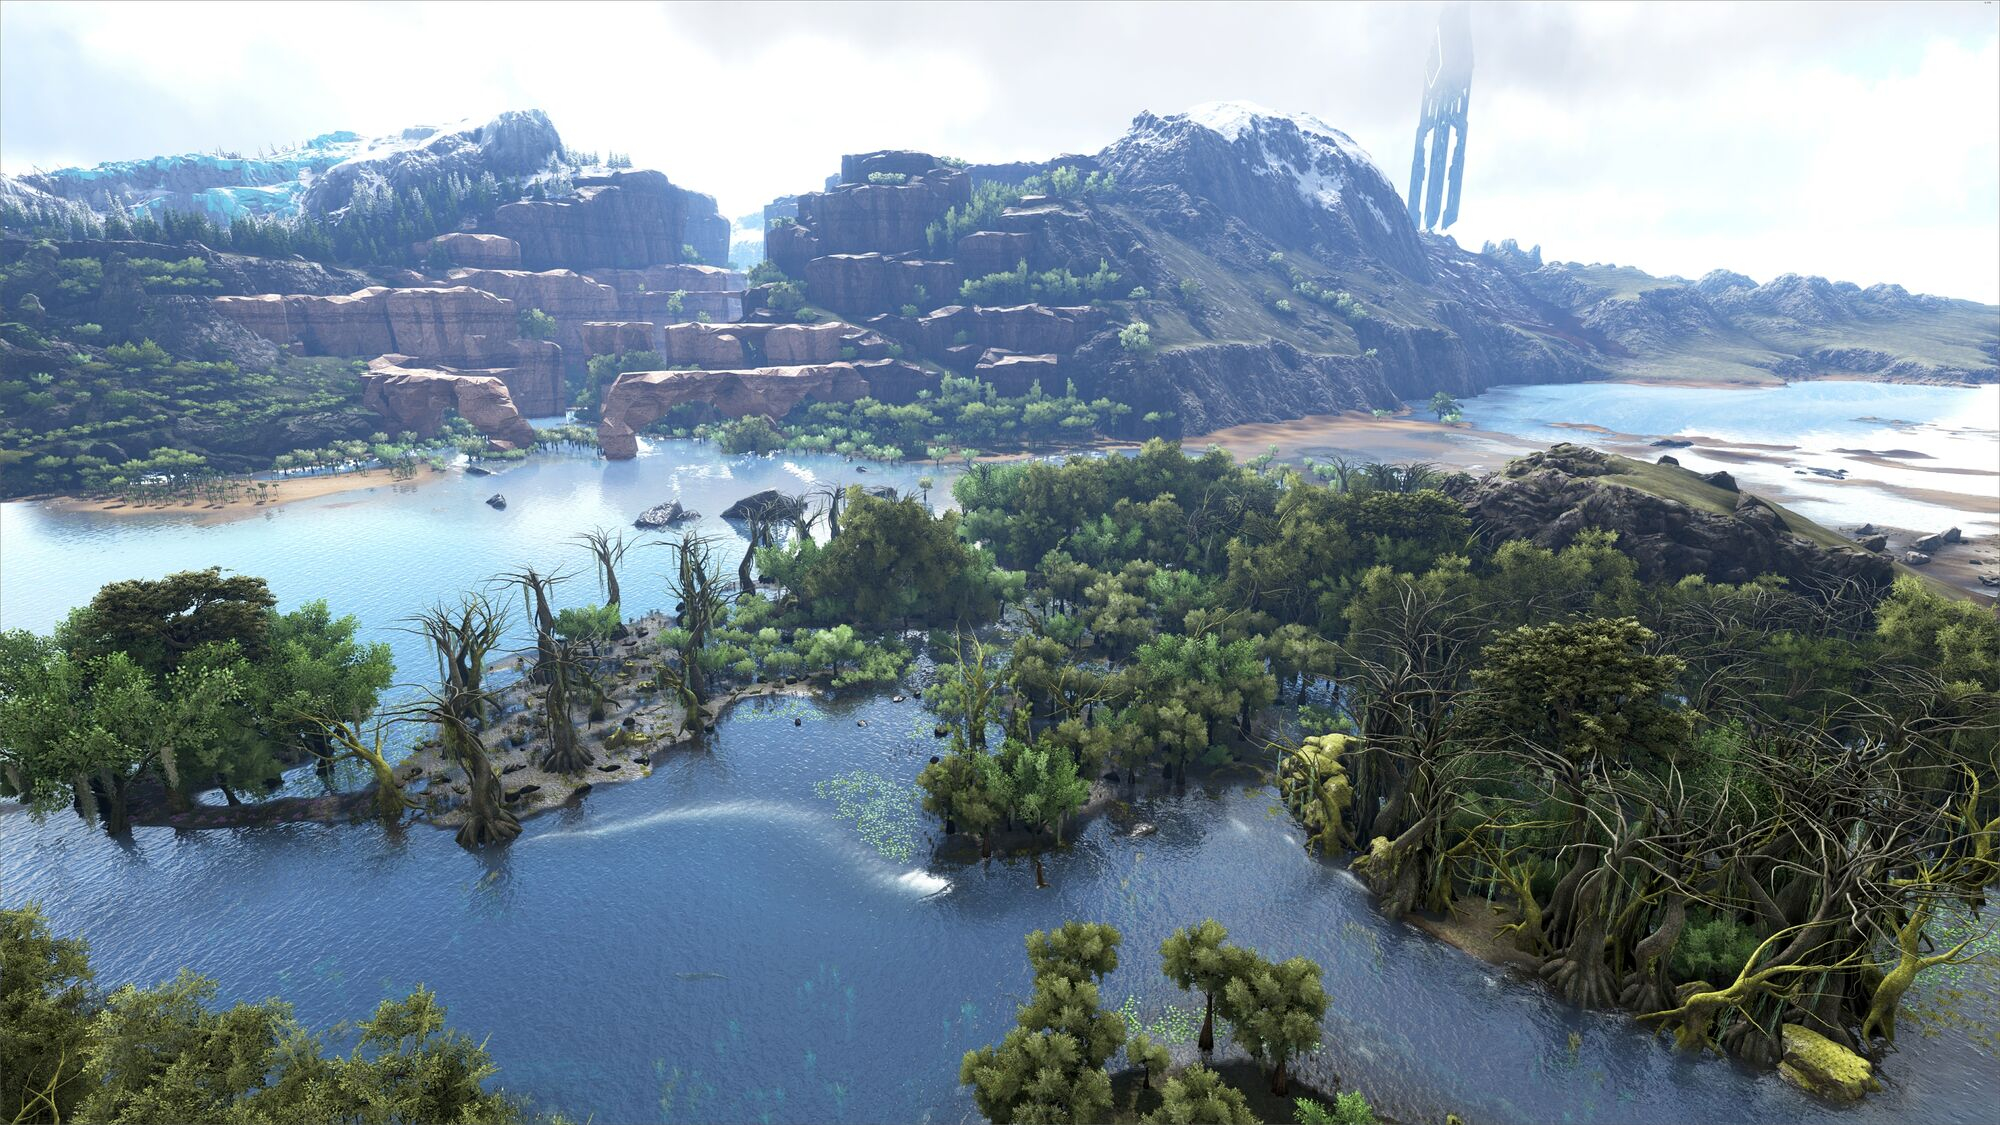 Swamp | Ragnarok - ARK:Survival Evolved Map Wiki | FANDOM